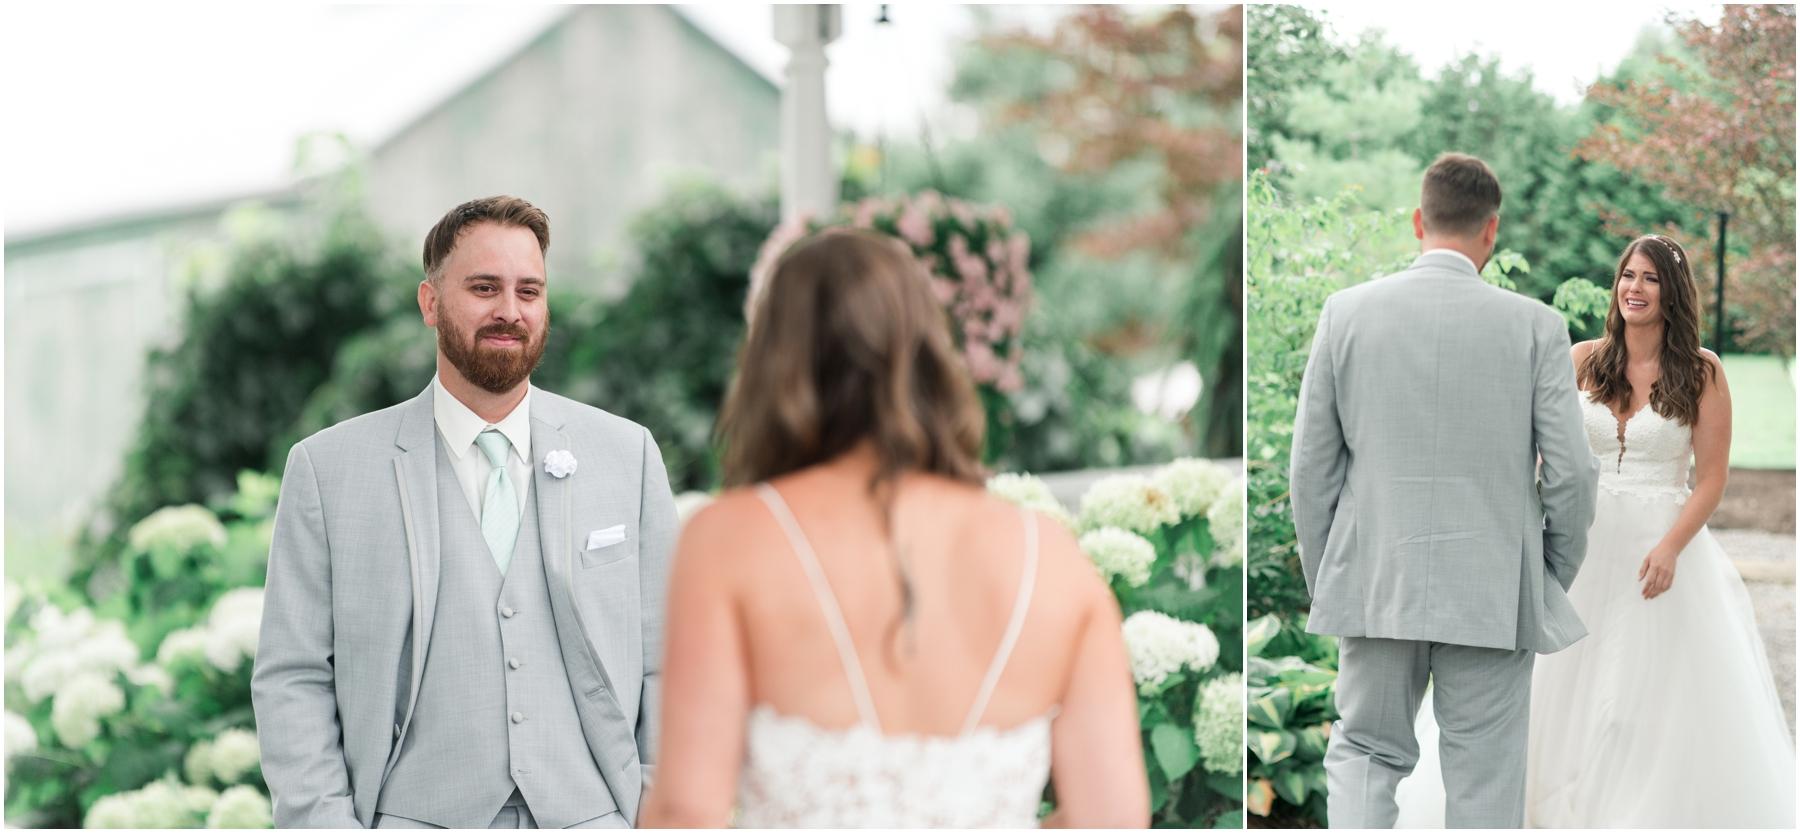 Bloom Field Gardens Wedding Precious Photography_0326